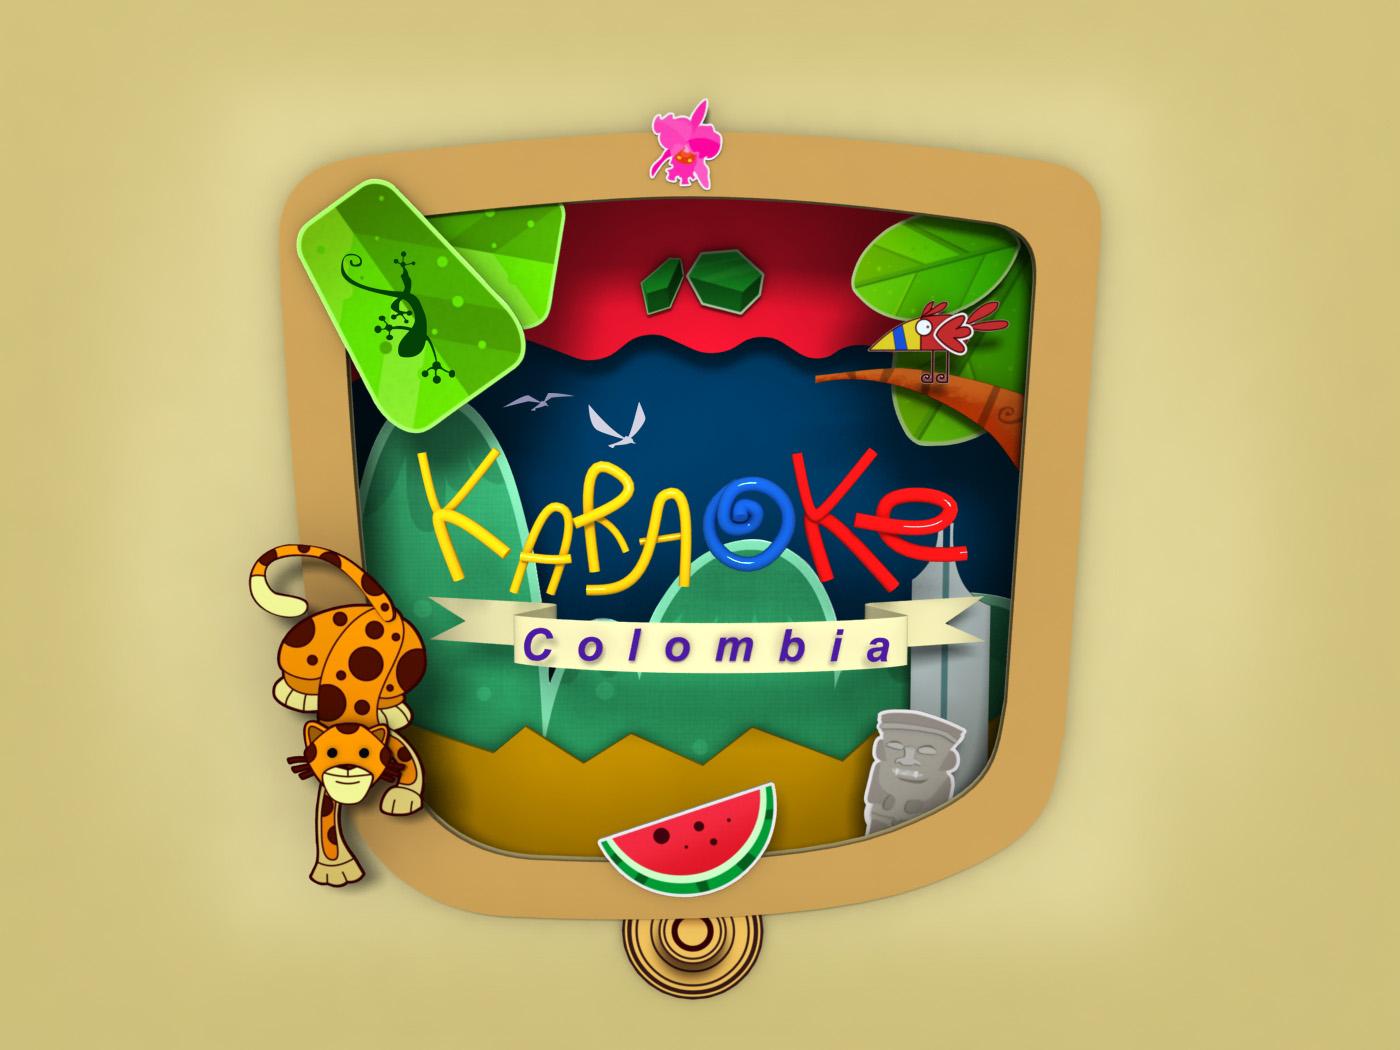 Karaoke Colombia 03 illustration 3dsmax 3d